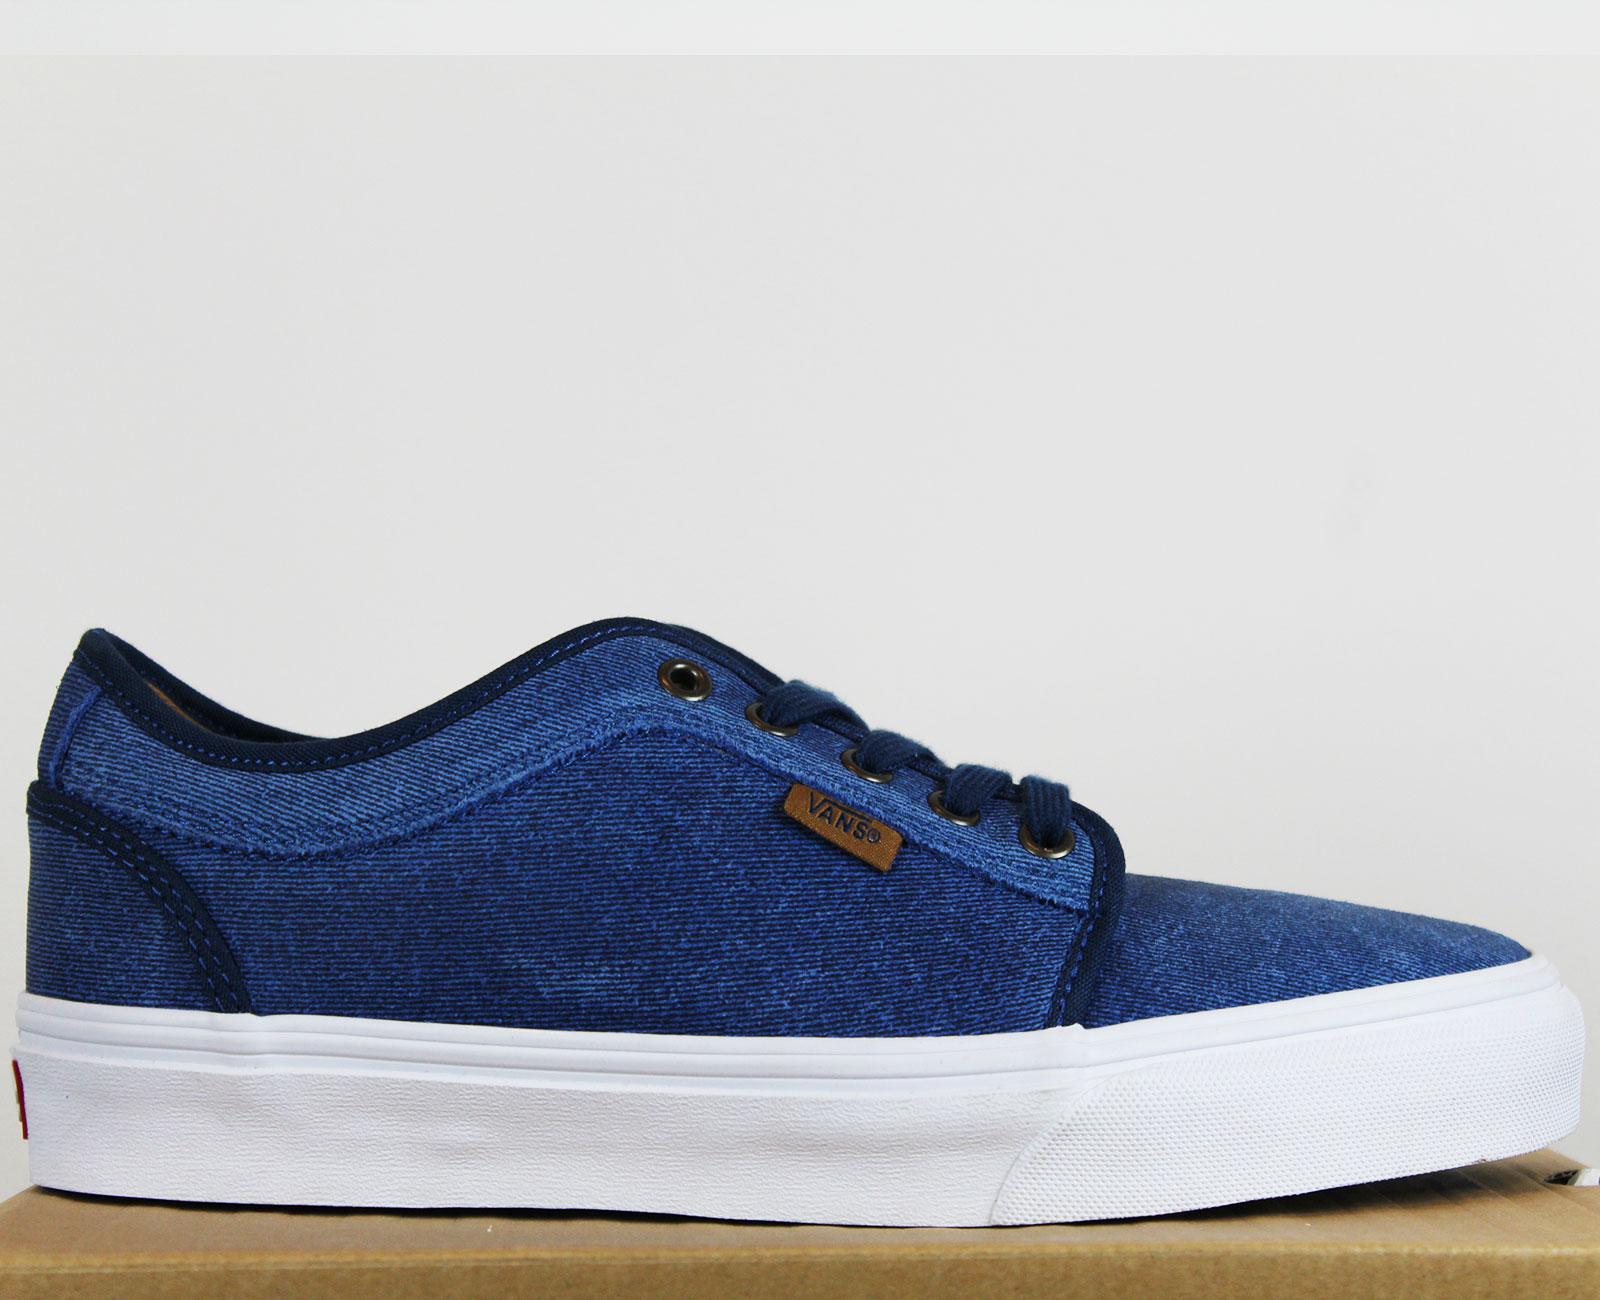 vans off the wall herren sneaker slipper turnschuhe shoes canvas gr us 9 neu ebay. Black Bedroom Furniture Sets. Home Design Ideas